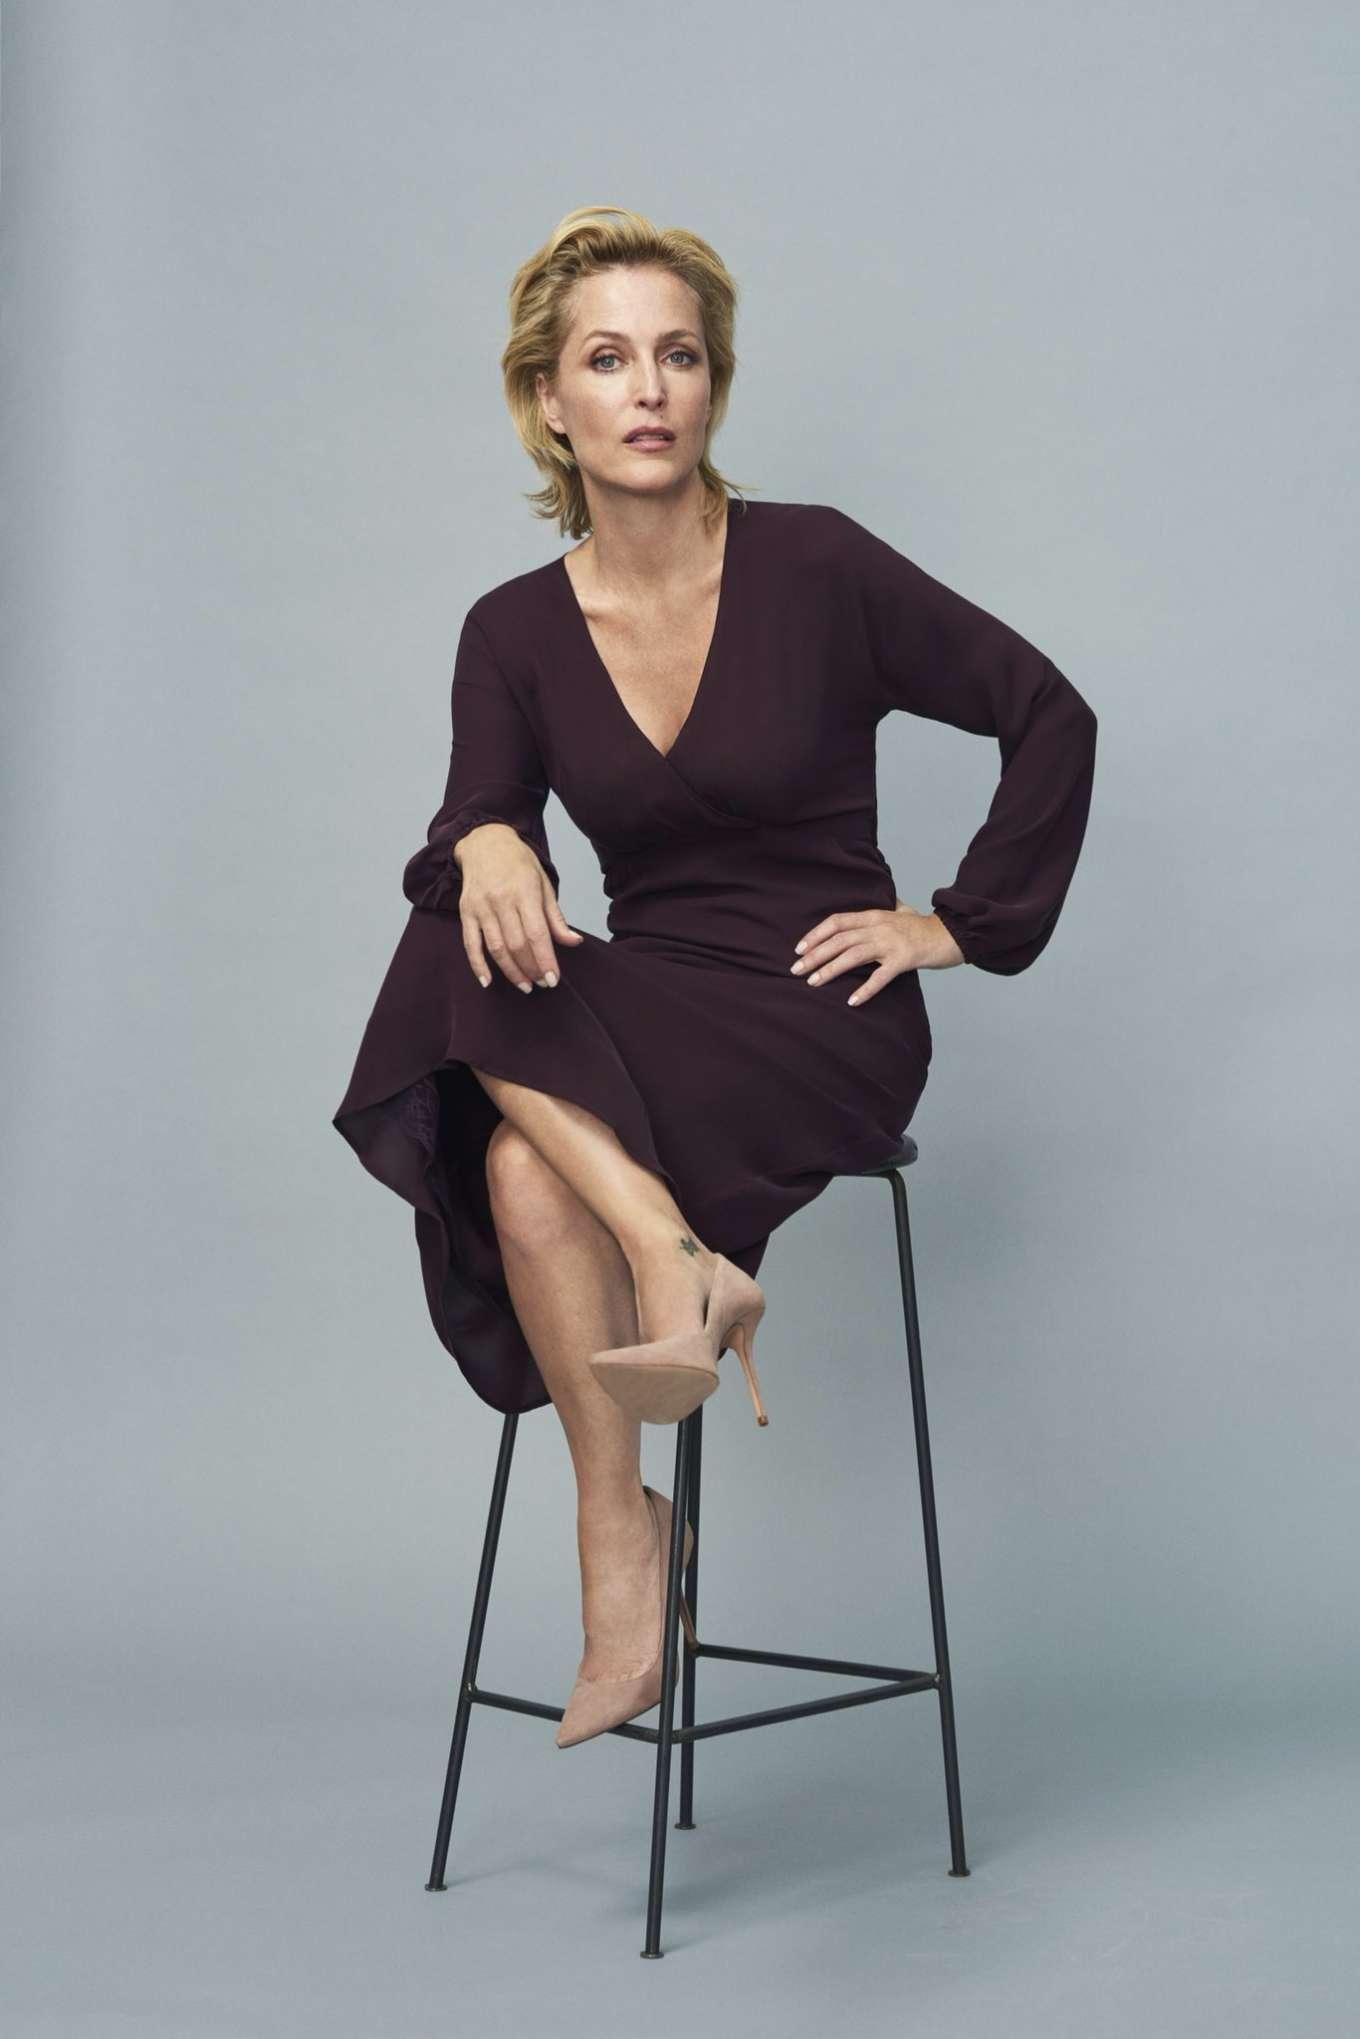 Gillian Anderson 2019 : Gillian Anderson – Winser London Collection photoshoot-01